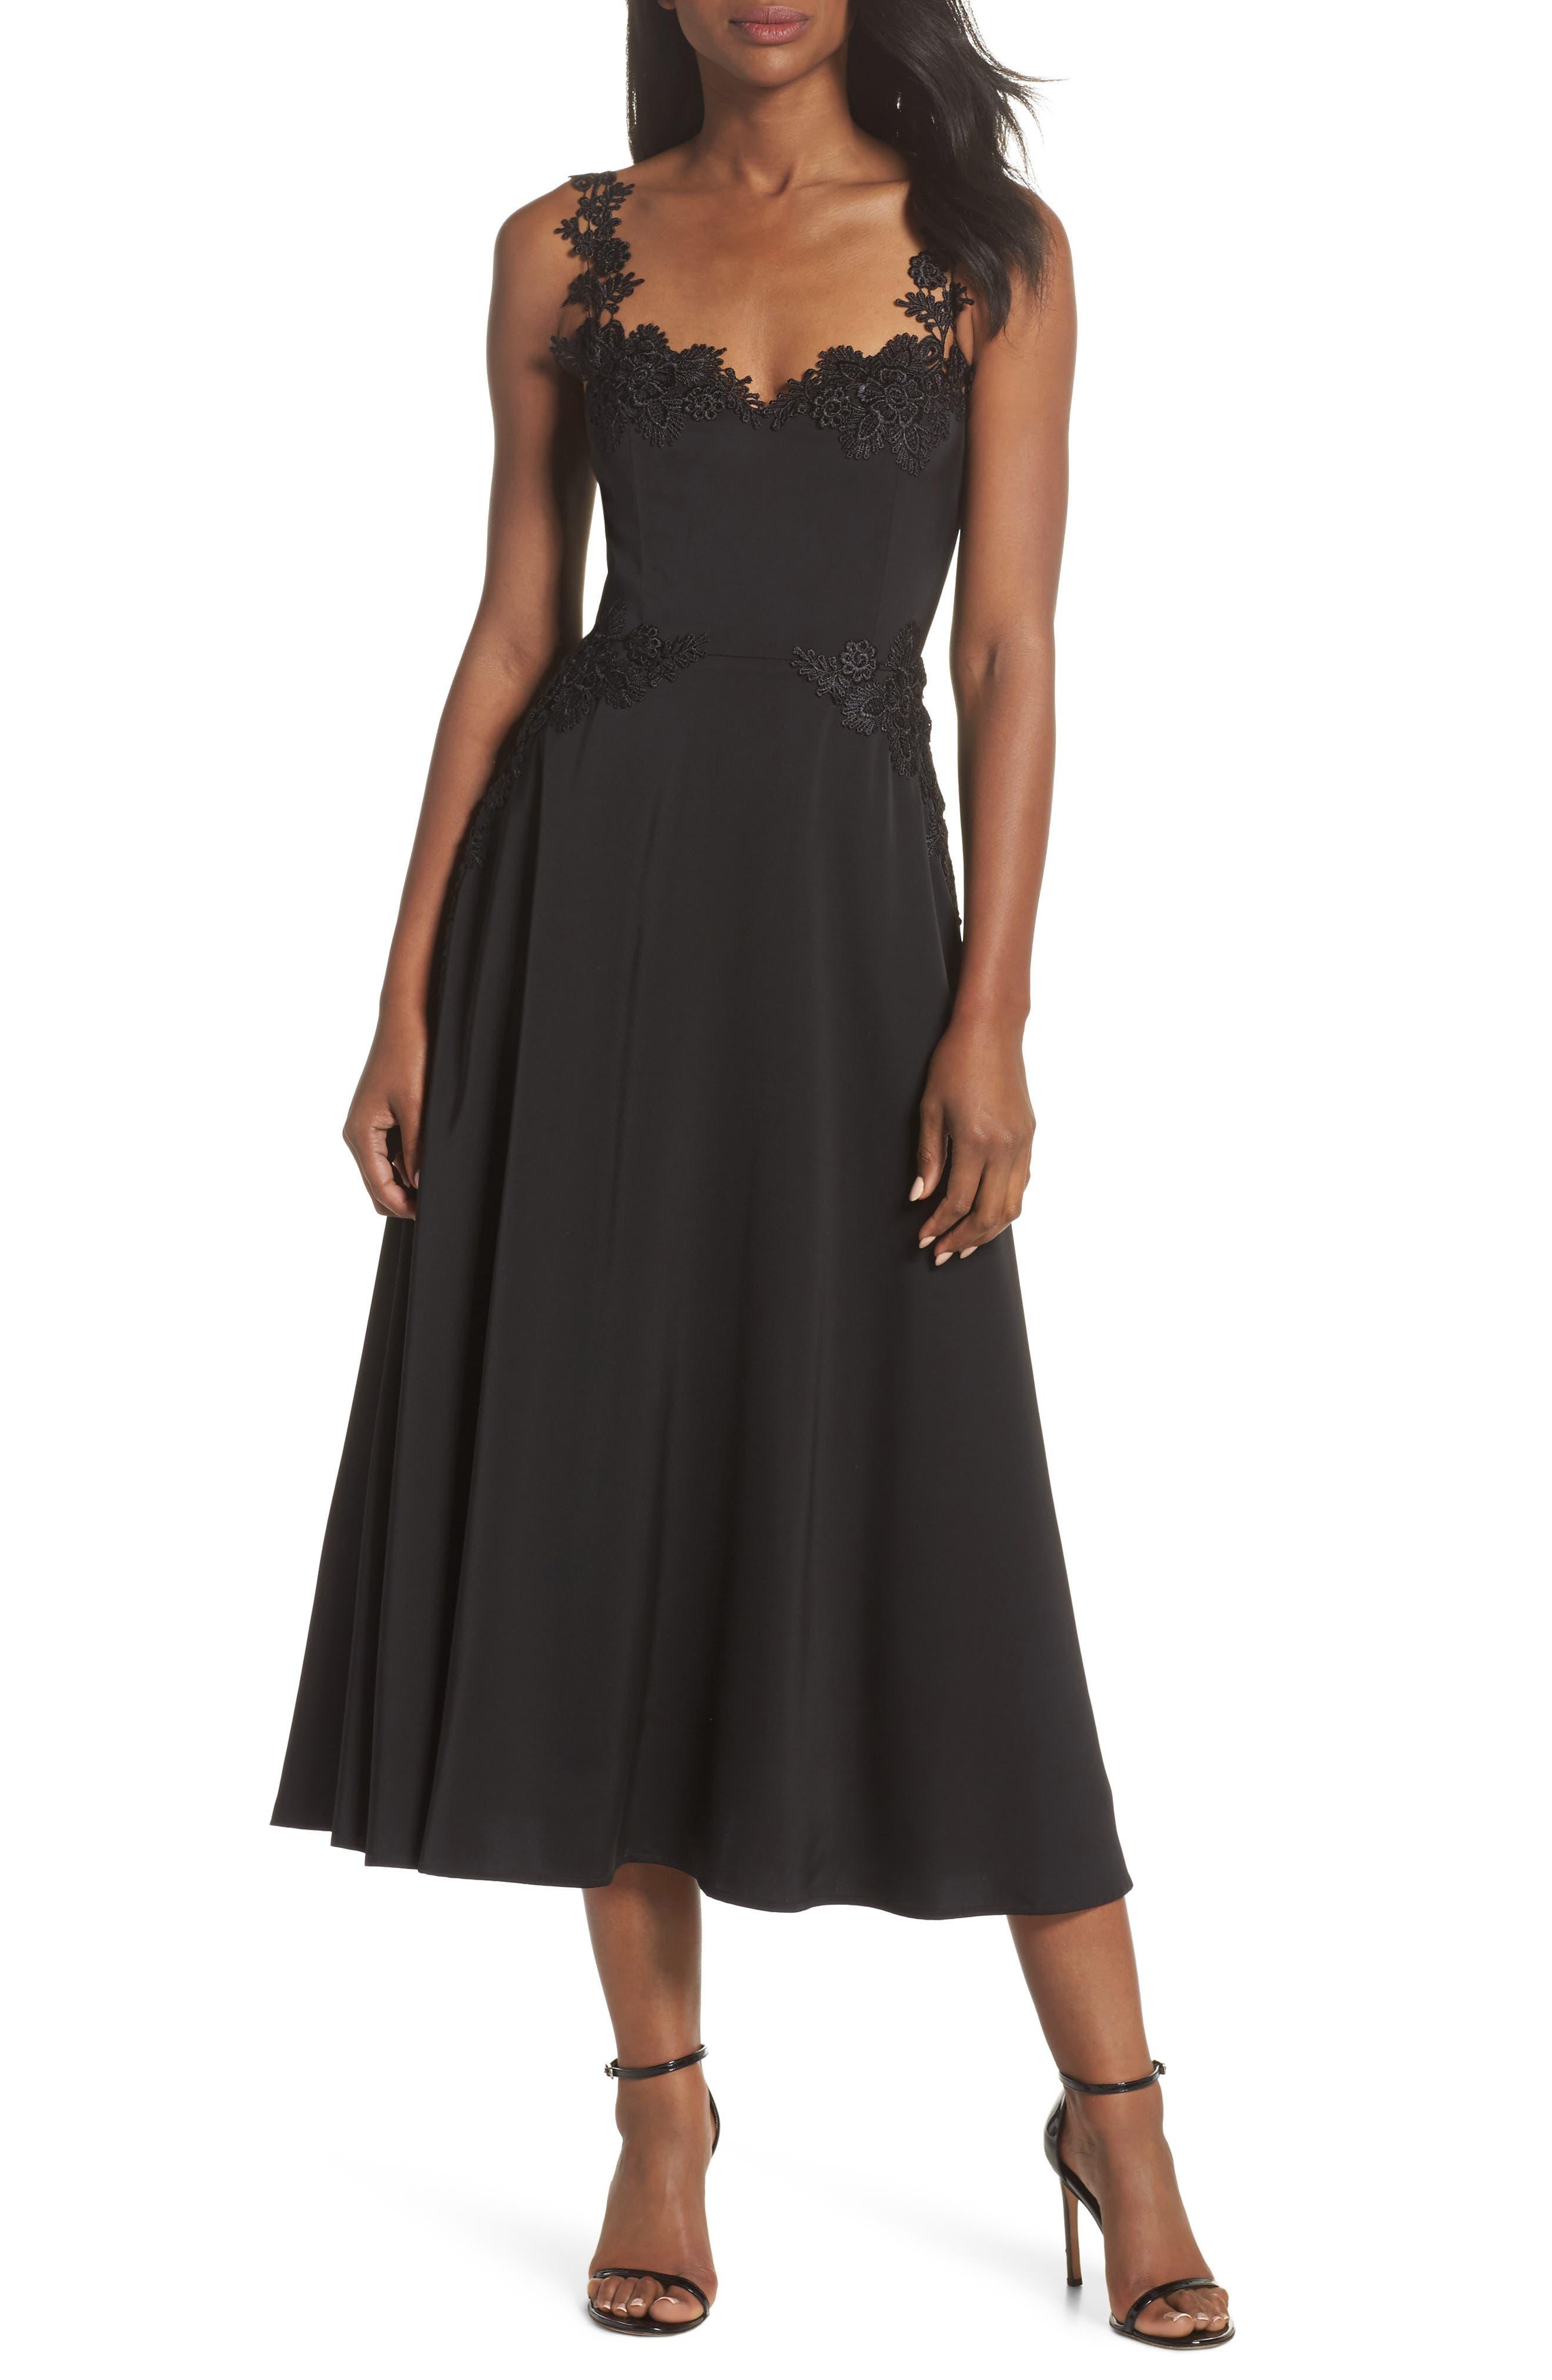 Aislinn Floral Appliqué Tea Length Dress,                         Main,                         color, Black Multi